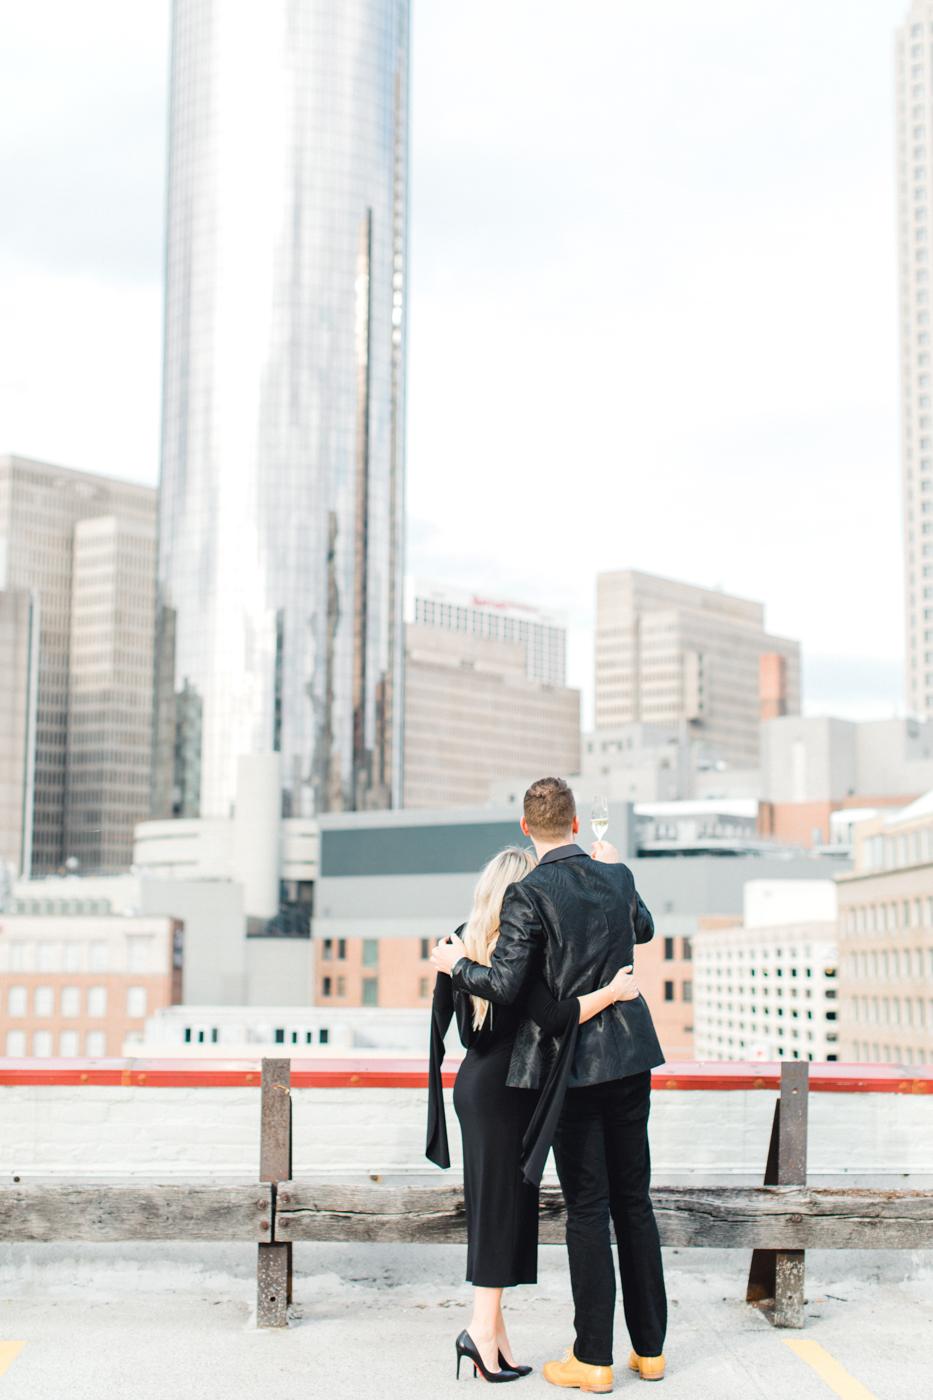 four corners photography best atlanta wedding photographer downtown atlanta engagement session engagement proposal ventanas downtown atlanta wedding atlanta wedding photographer-11.jpg